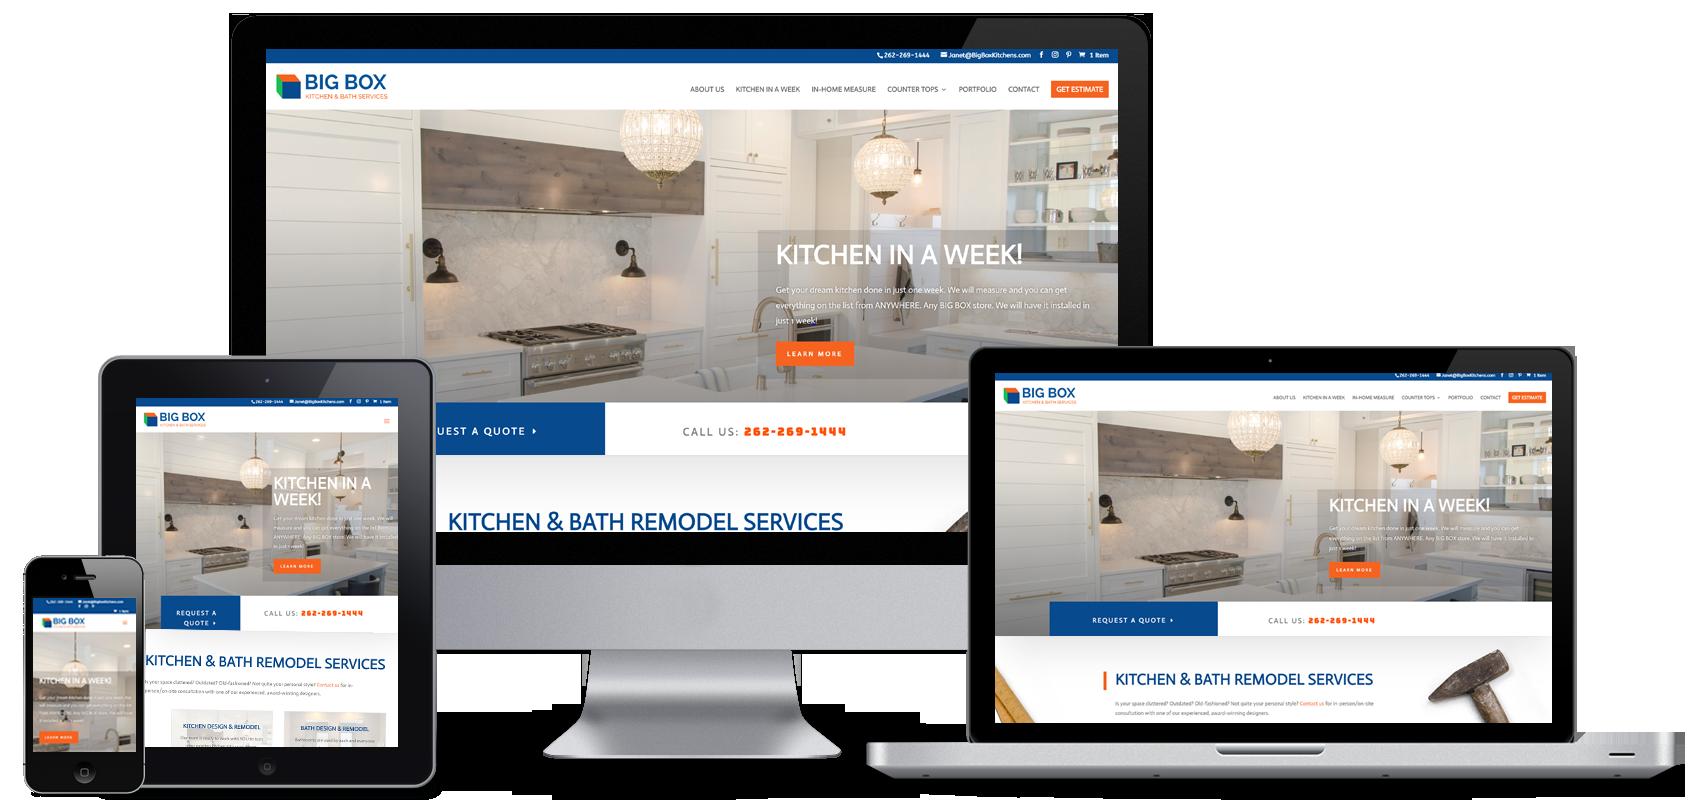 big box kitchen remodel website